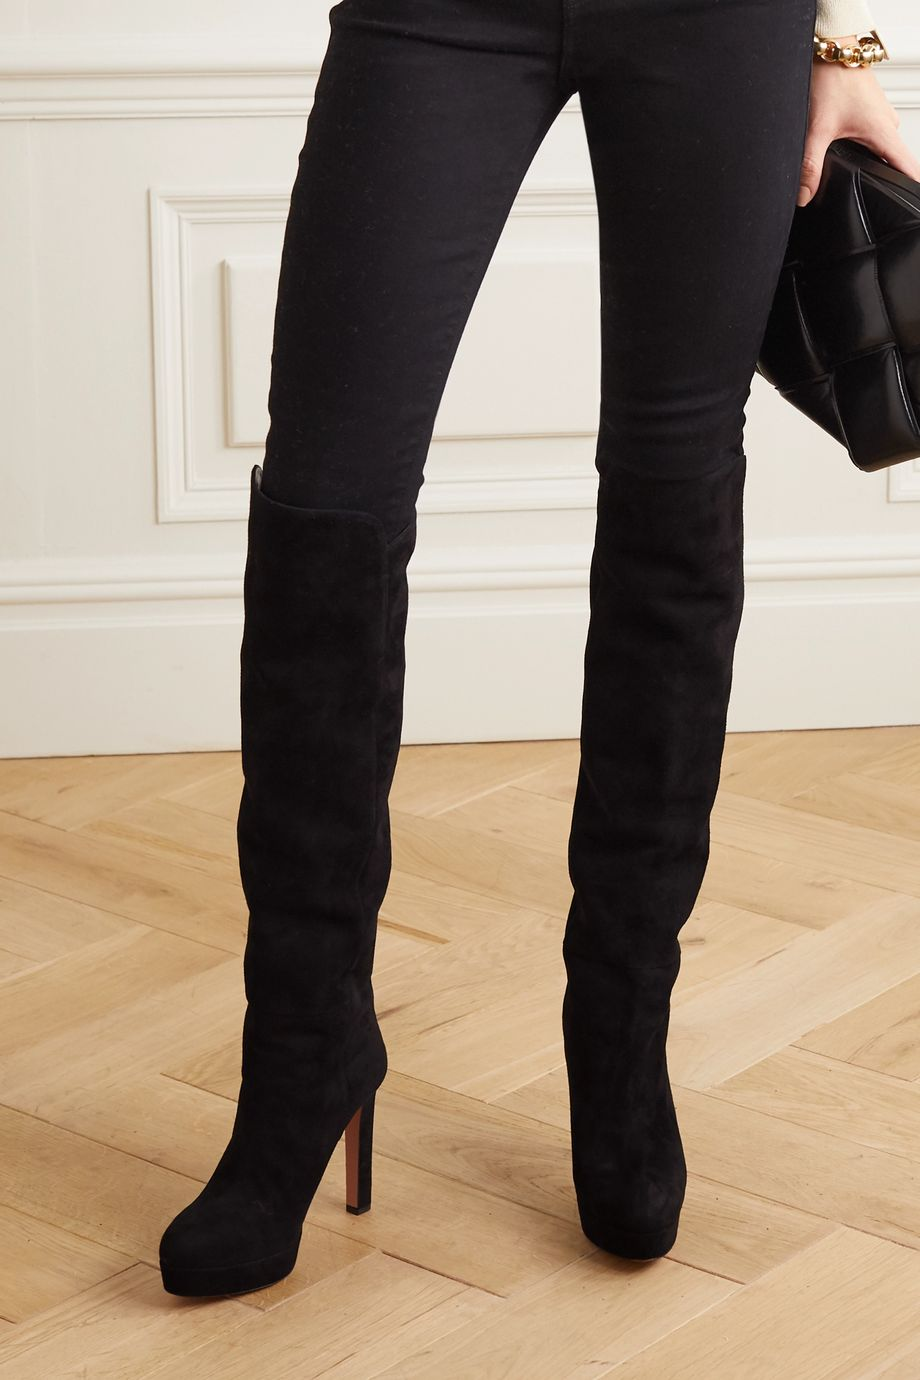 Aquazzura Gainsbourg 120 suede knee boots